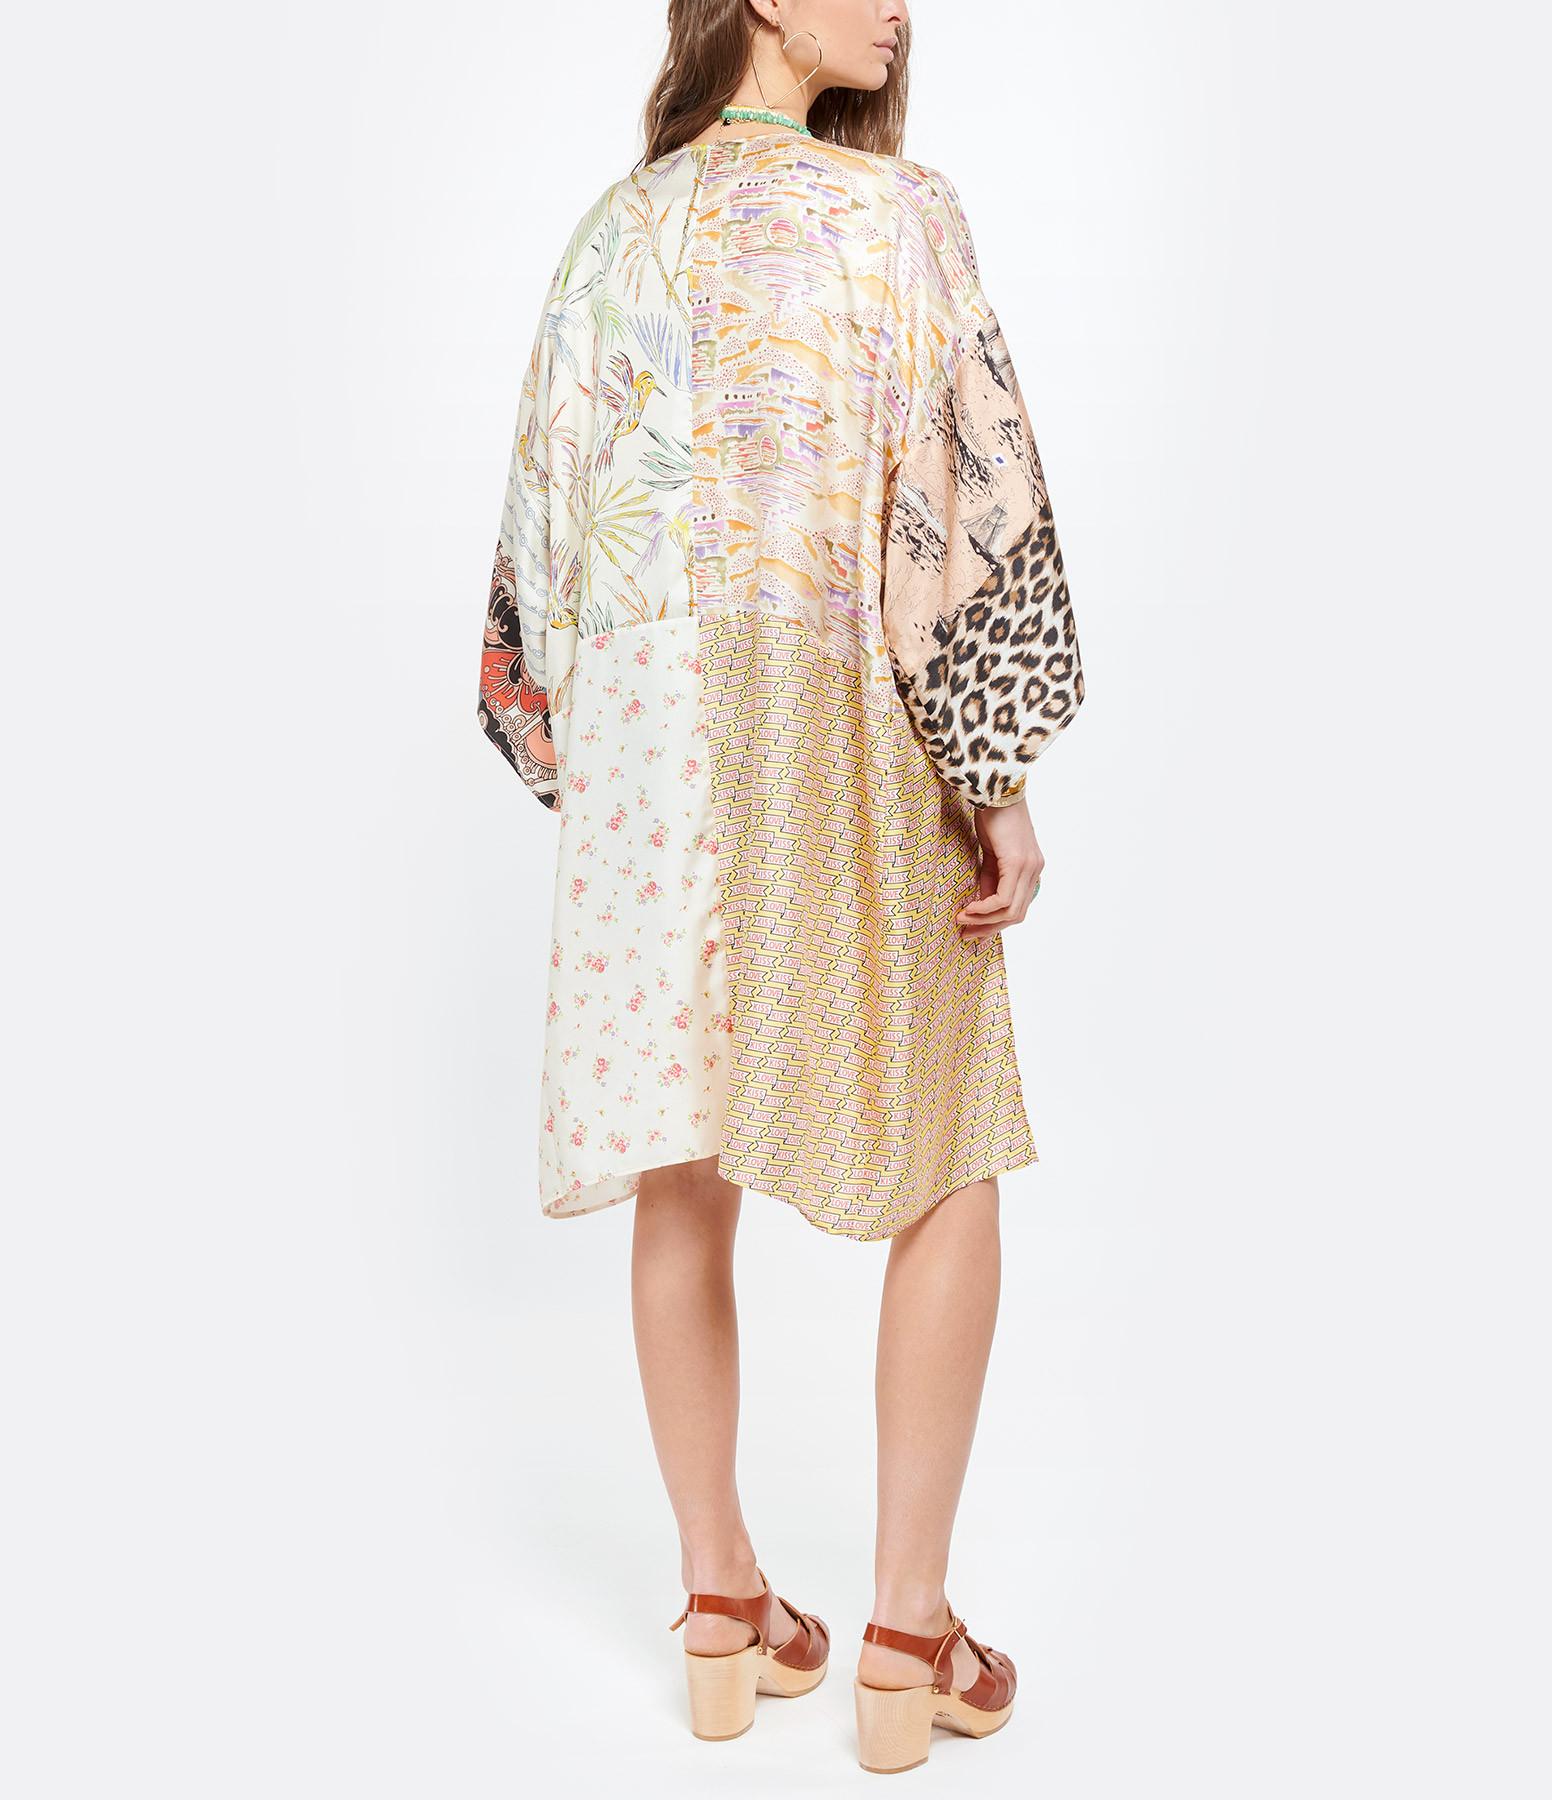 LA PRESTIC OUISTON - Veste Kimono Plage Soie Sunset Beige Imprimé